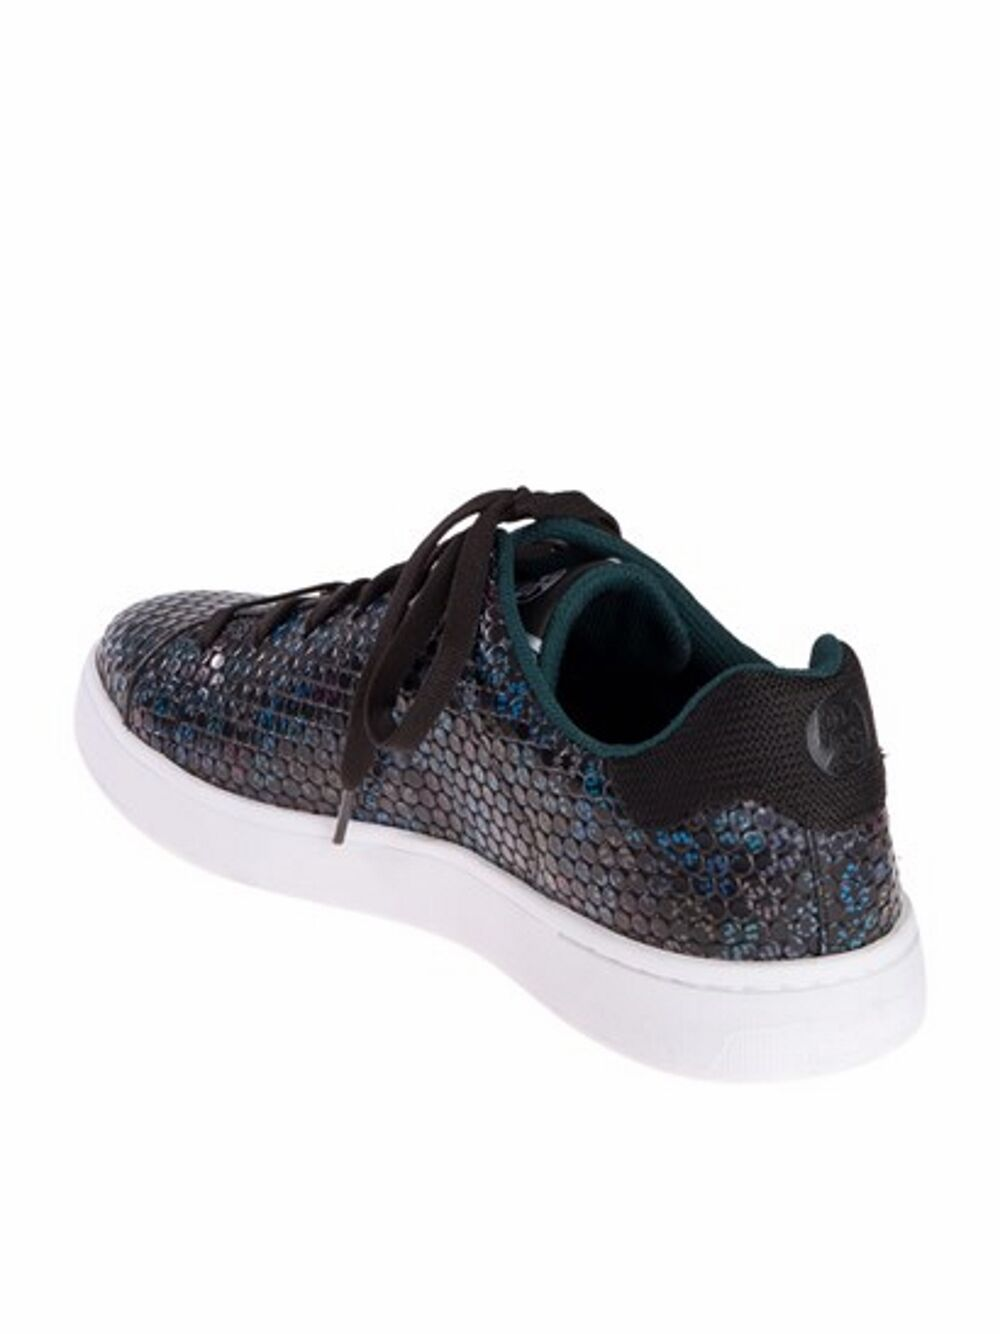 Paul Smith  Print trainers, serge trainers, Print Serge print trainers scarpe da ginnastica ba0ec9